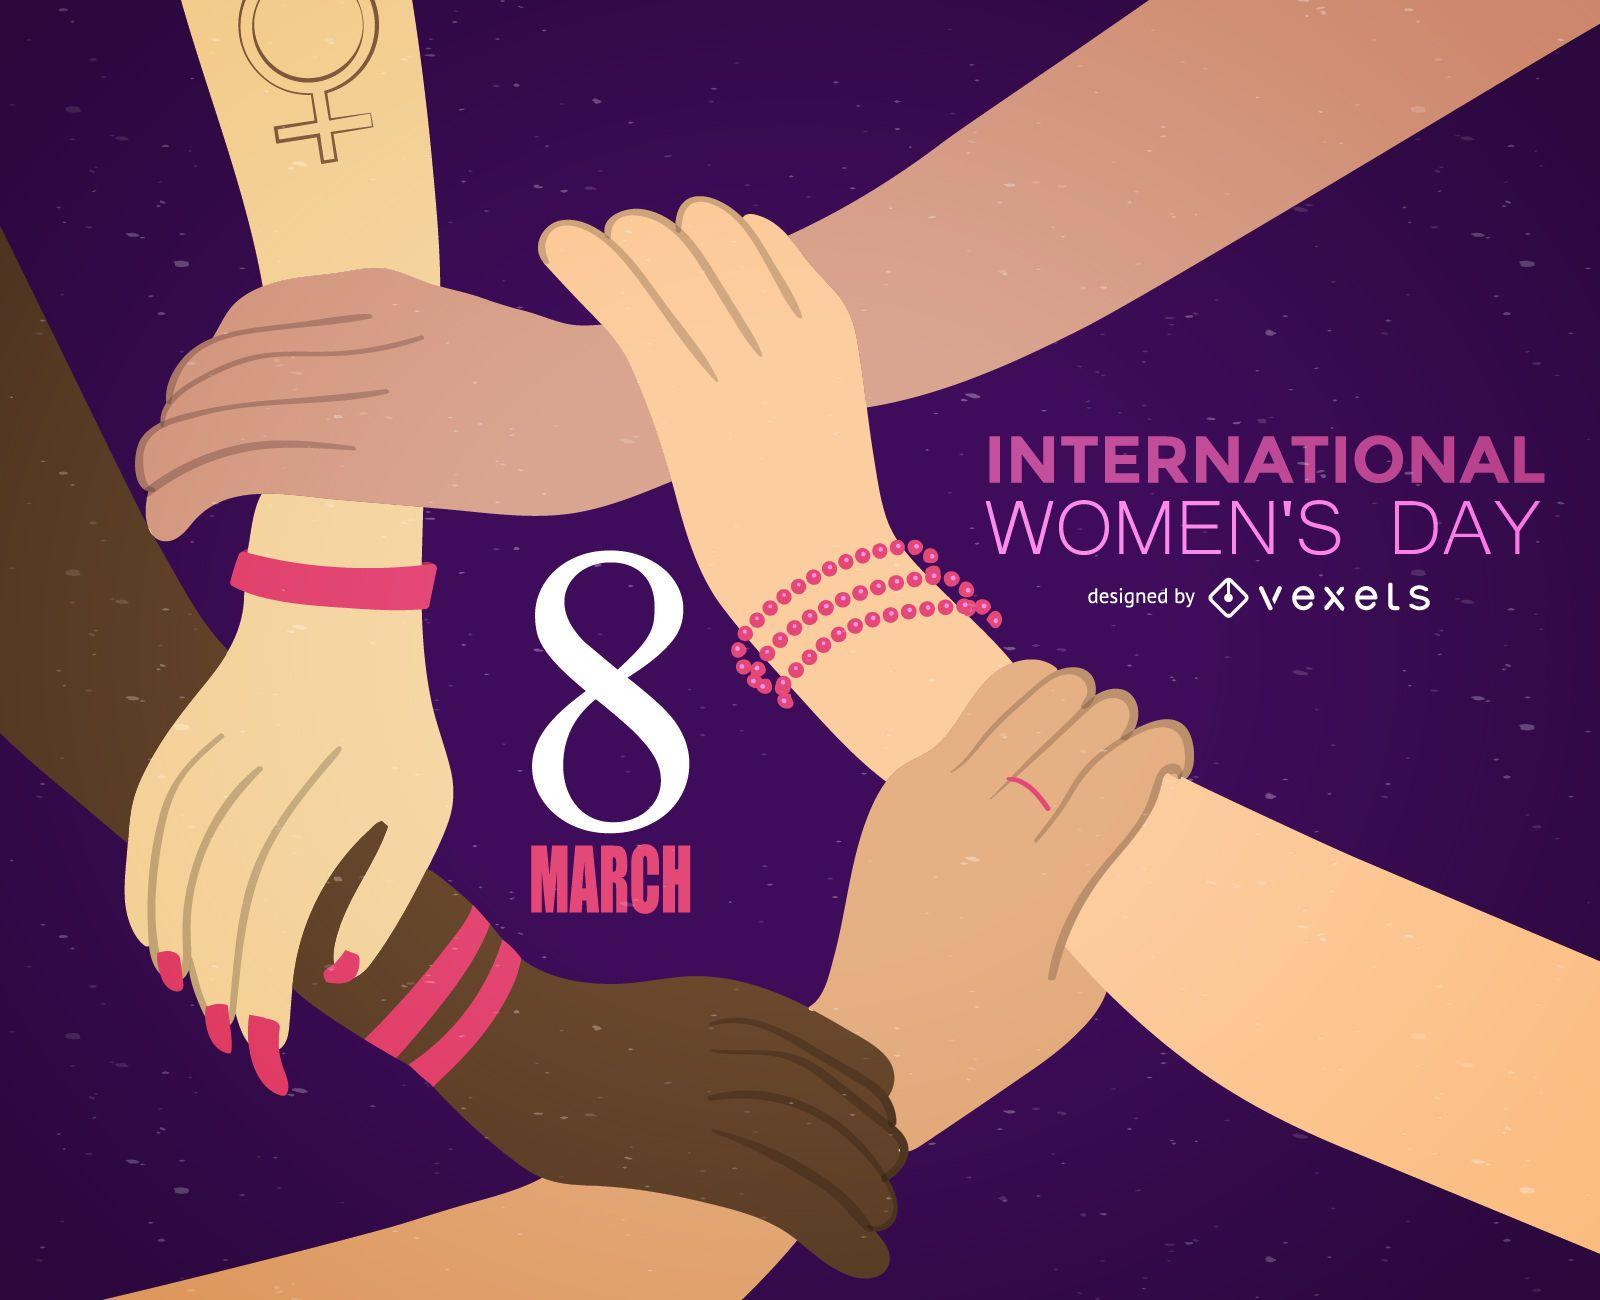 8 March International Women's Day illustration